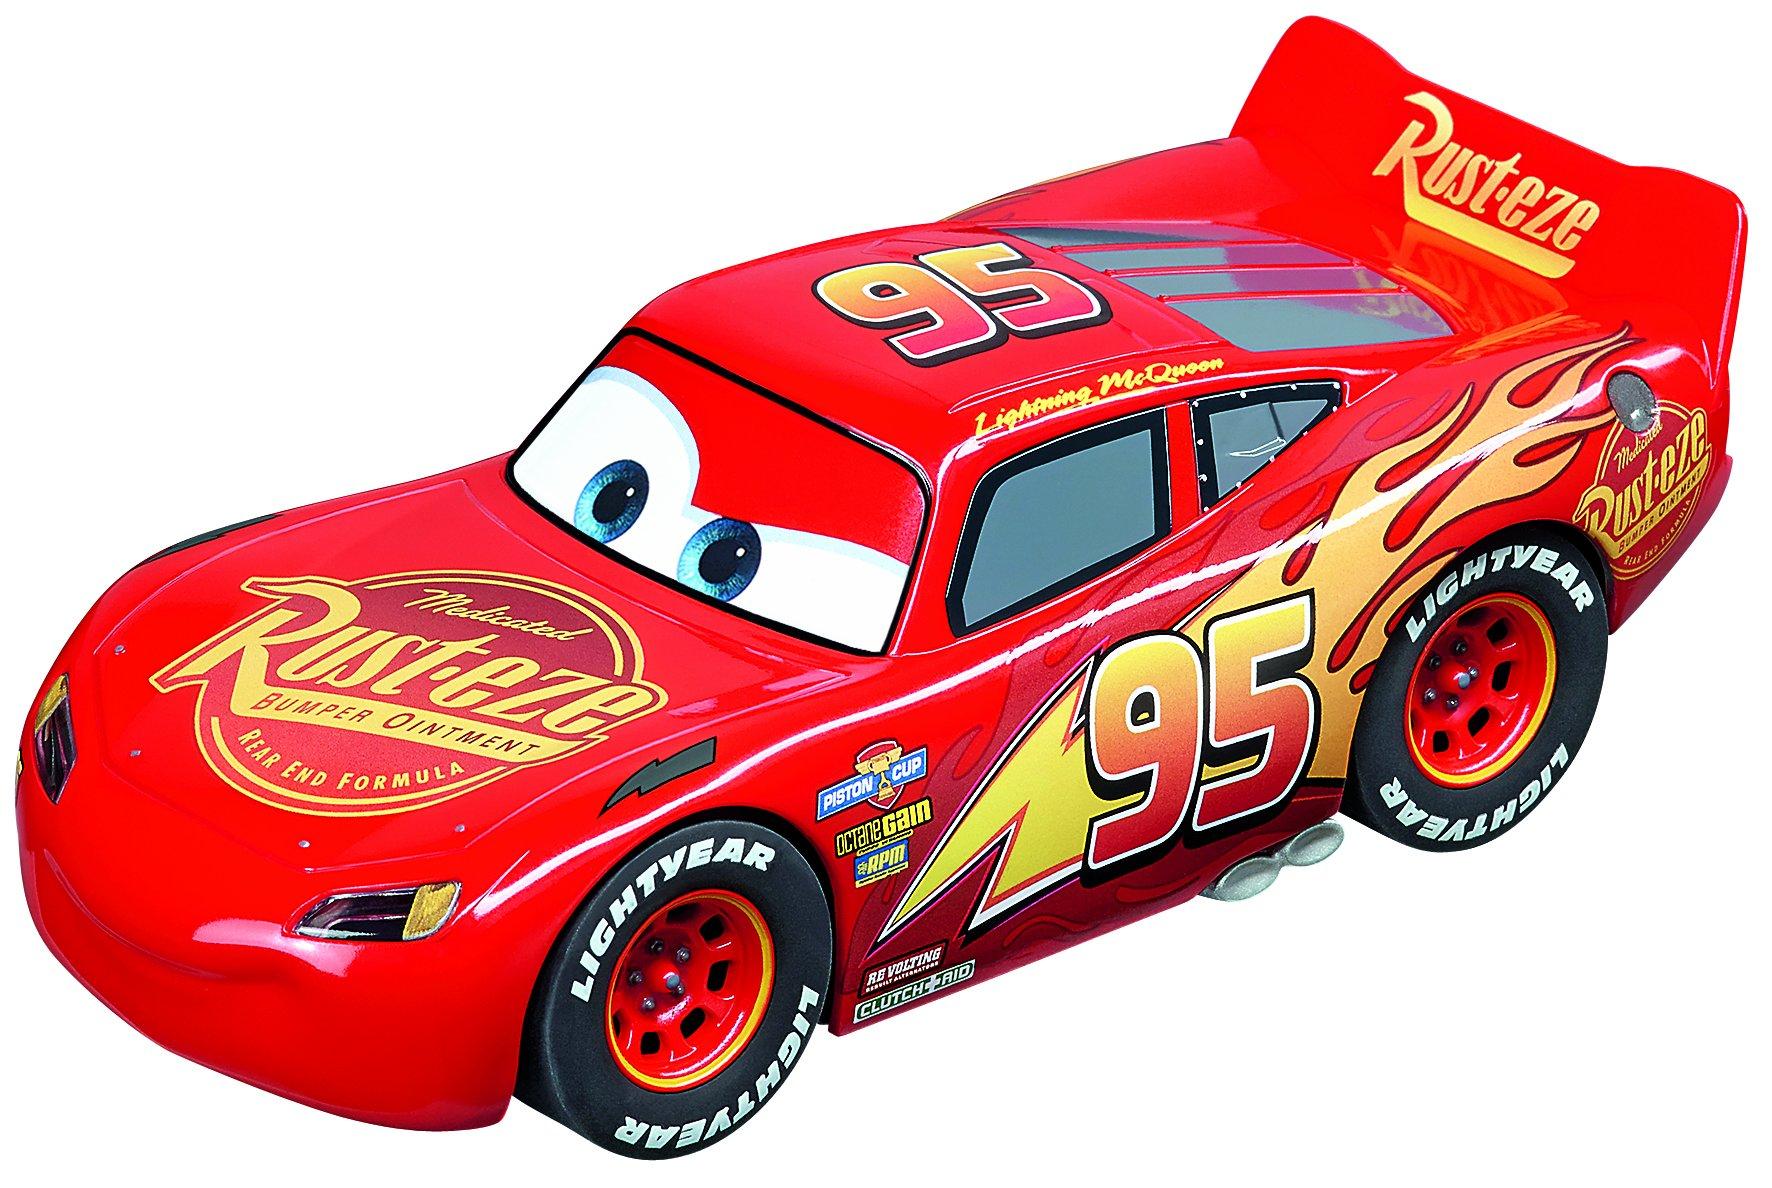 Carrera 30806Digital 132 Slot Car Racing Vehicle - Disney Pixar Cars 3 - Lightning McQueen - (1:32 Scale)